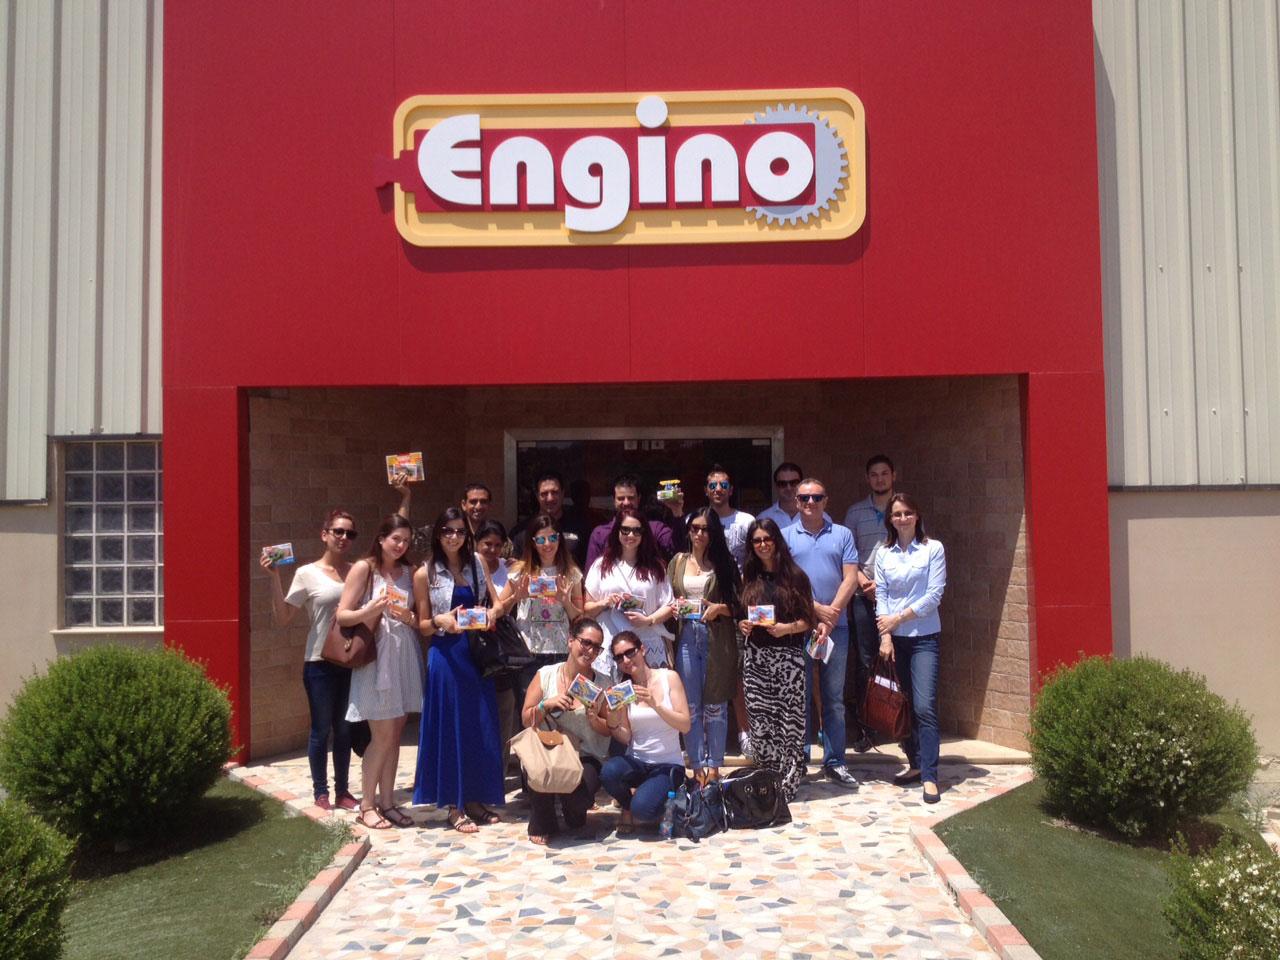 Engino Company Visit 2015